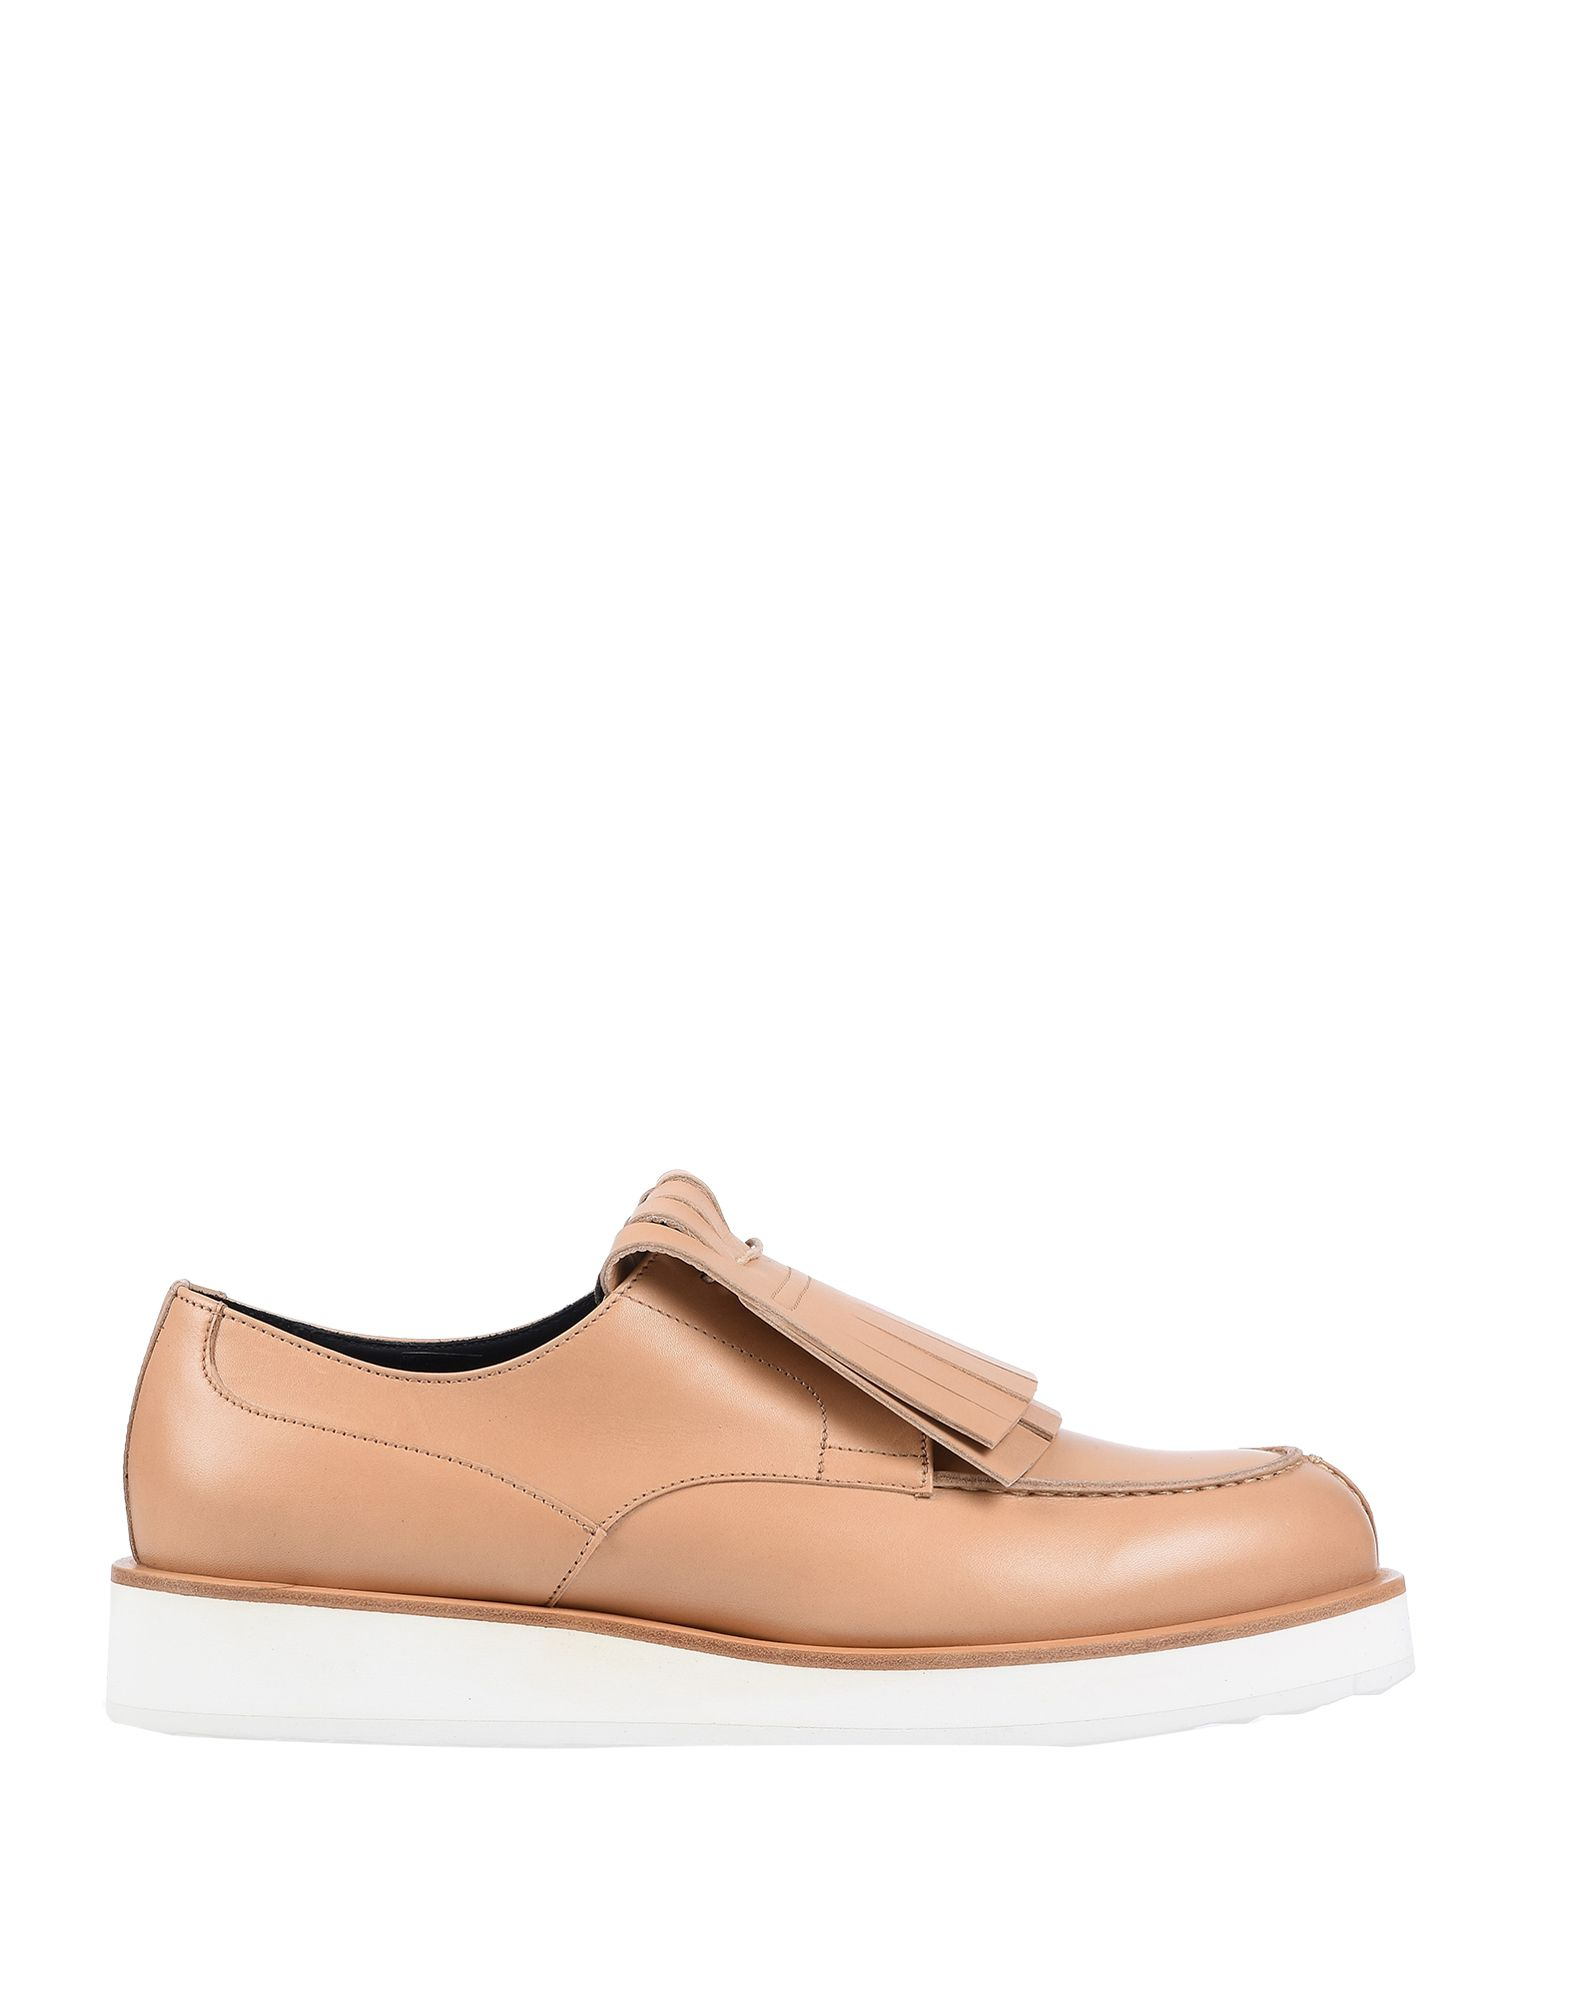 Фото - PIERRE HARDY Обувь на шнурках pierre hardy обувь на шнурках